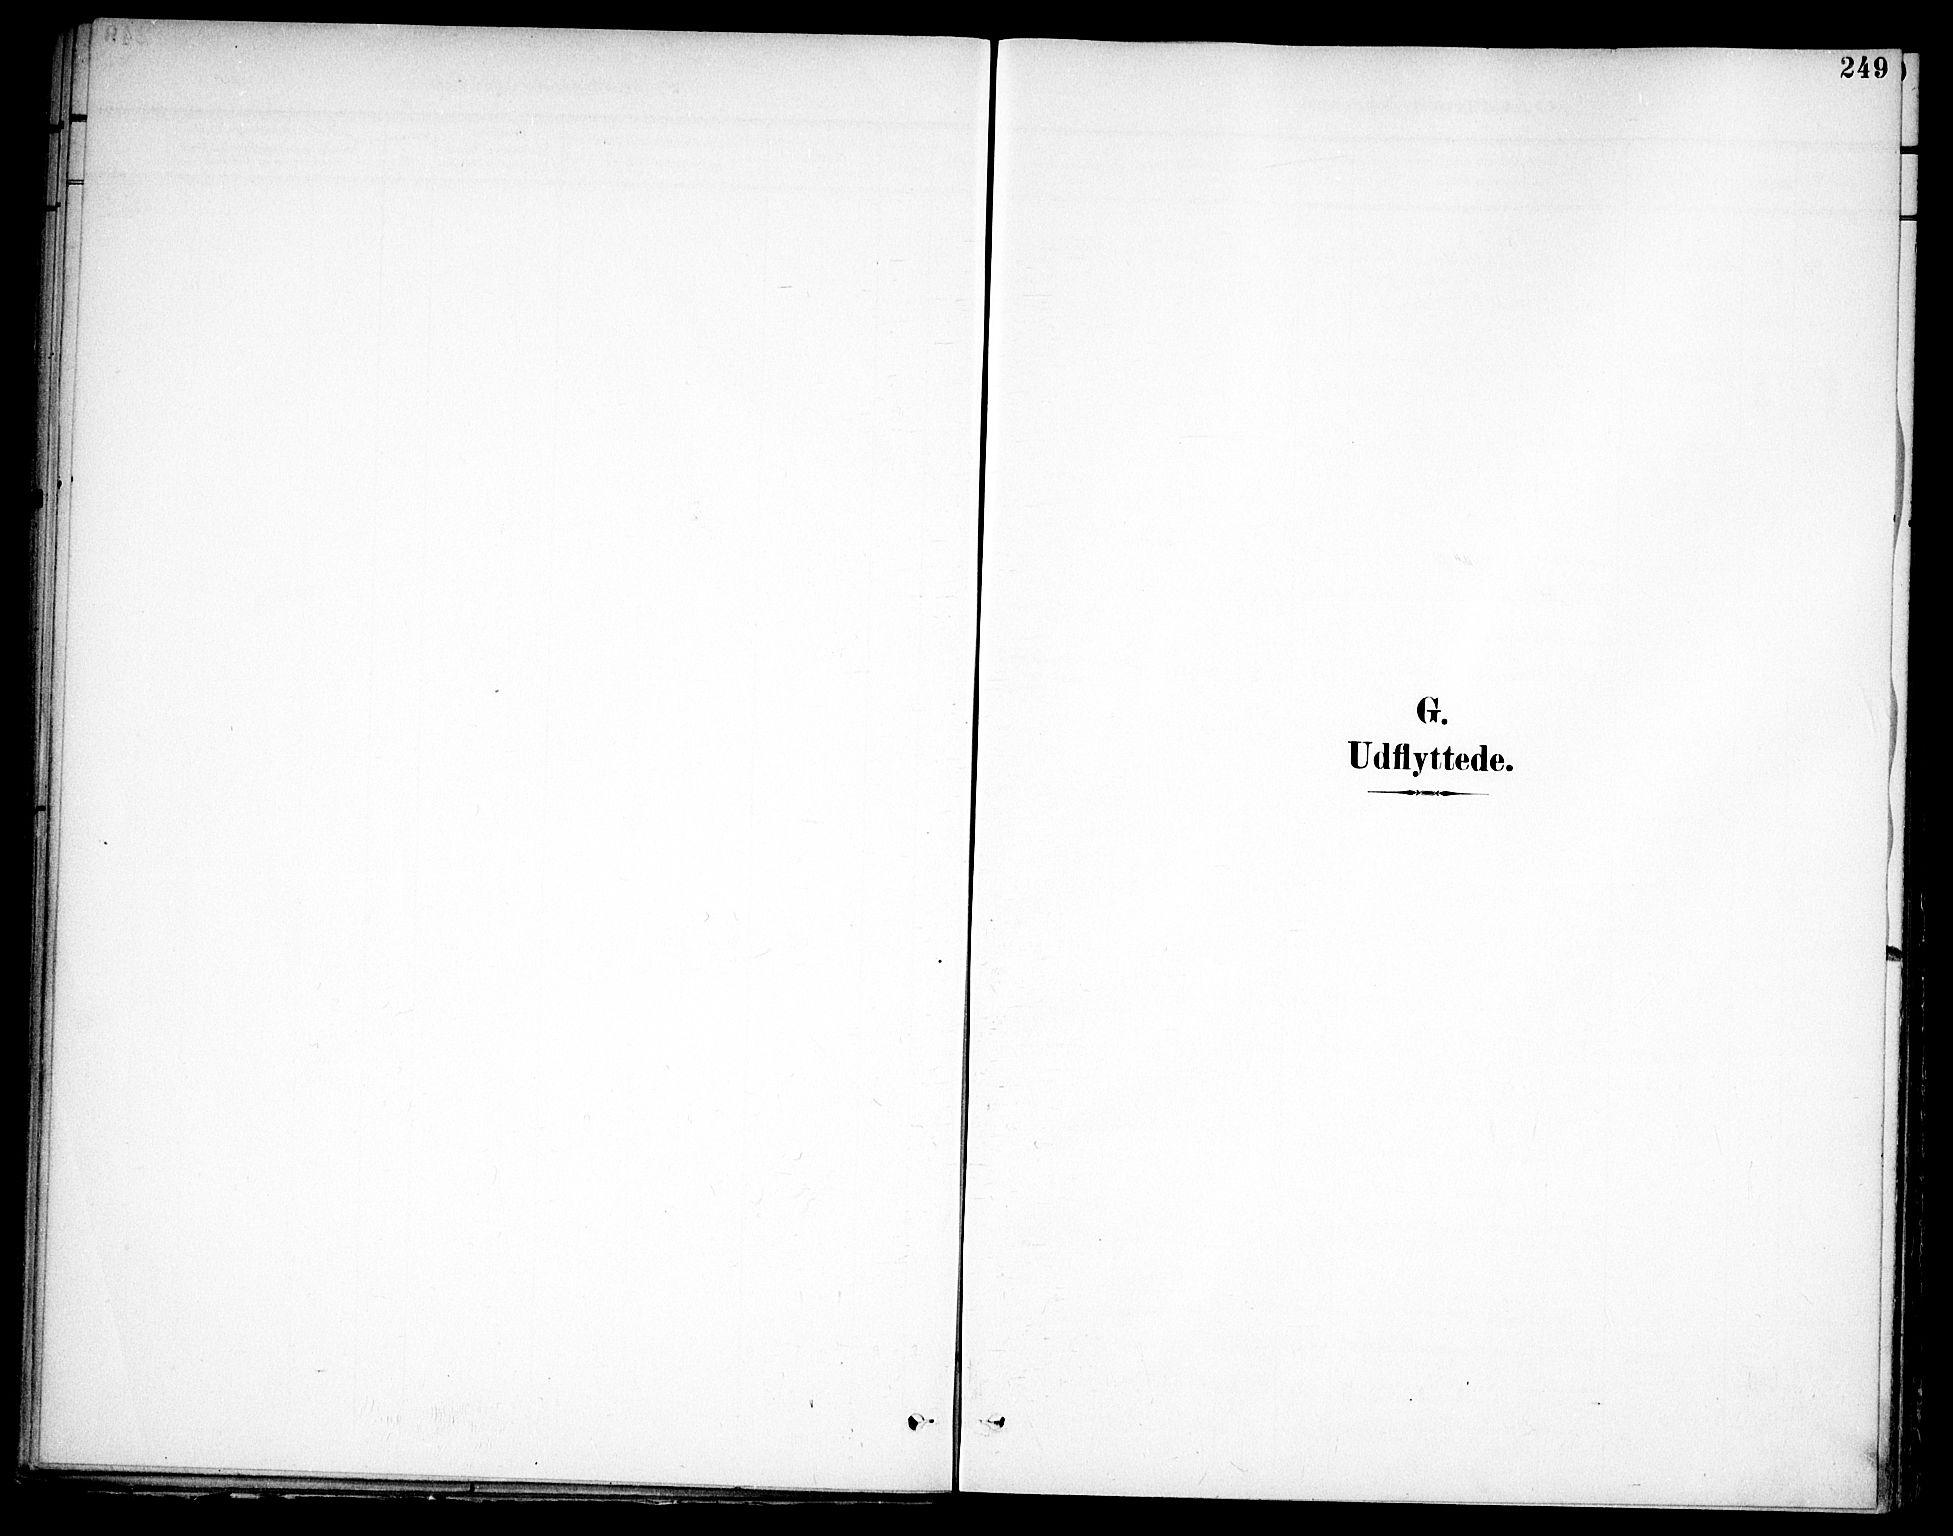 SAO, Høland prestekontor Kirkebøker, F/Fa/L0015: Ministerialbok nr. I 15, 1897-1912, s. 249